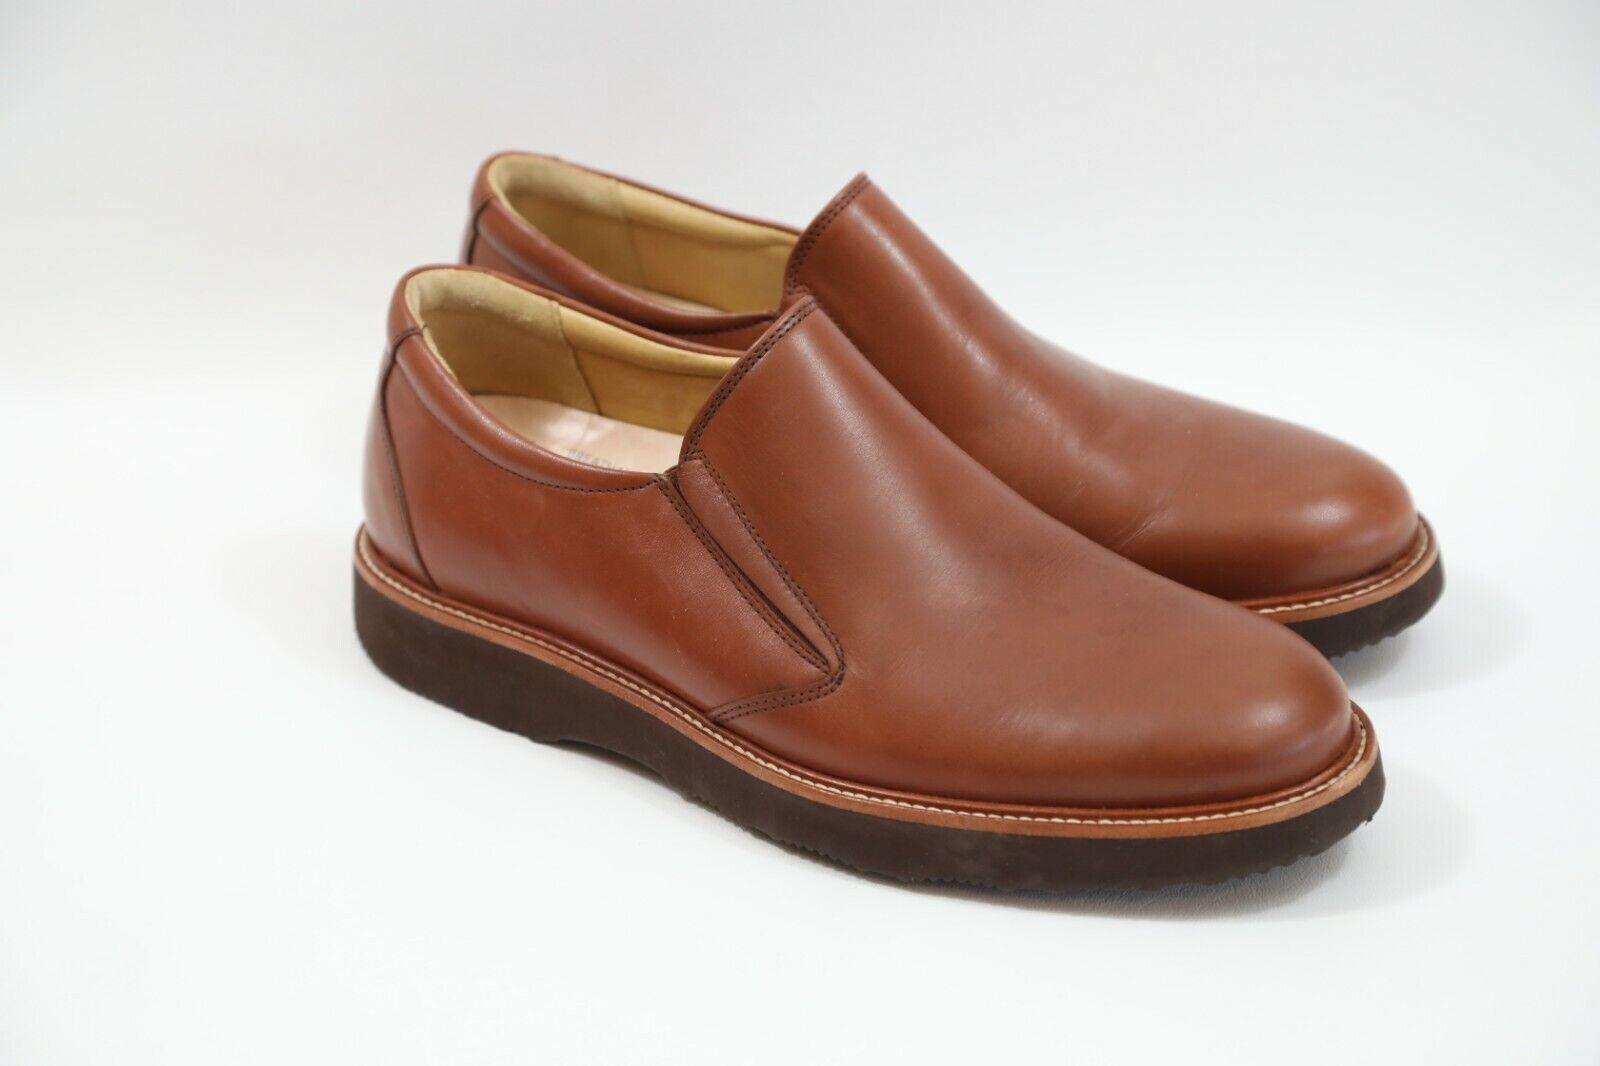 298 Samuel Hubbard Frequent Traveler Slip-On zapatos Talla 8 M